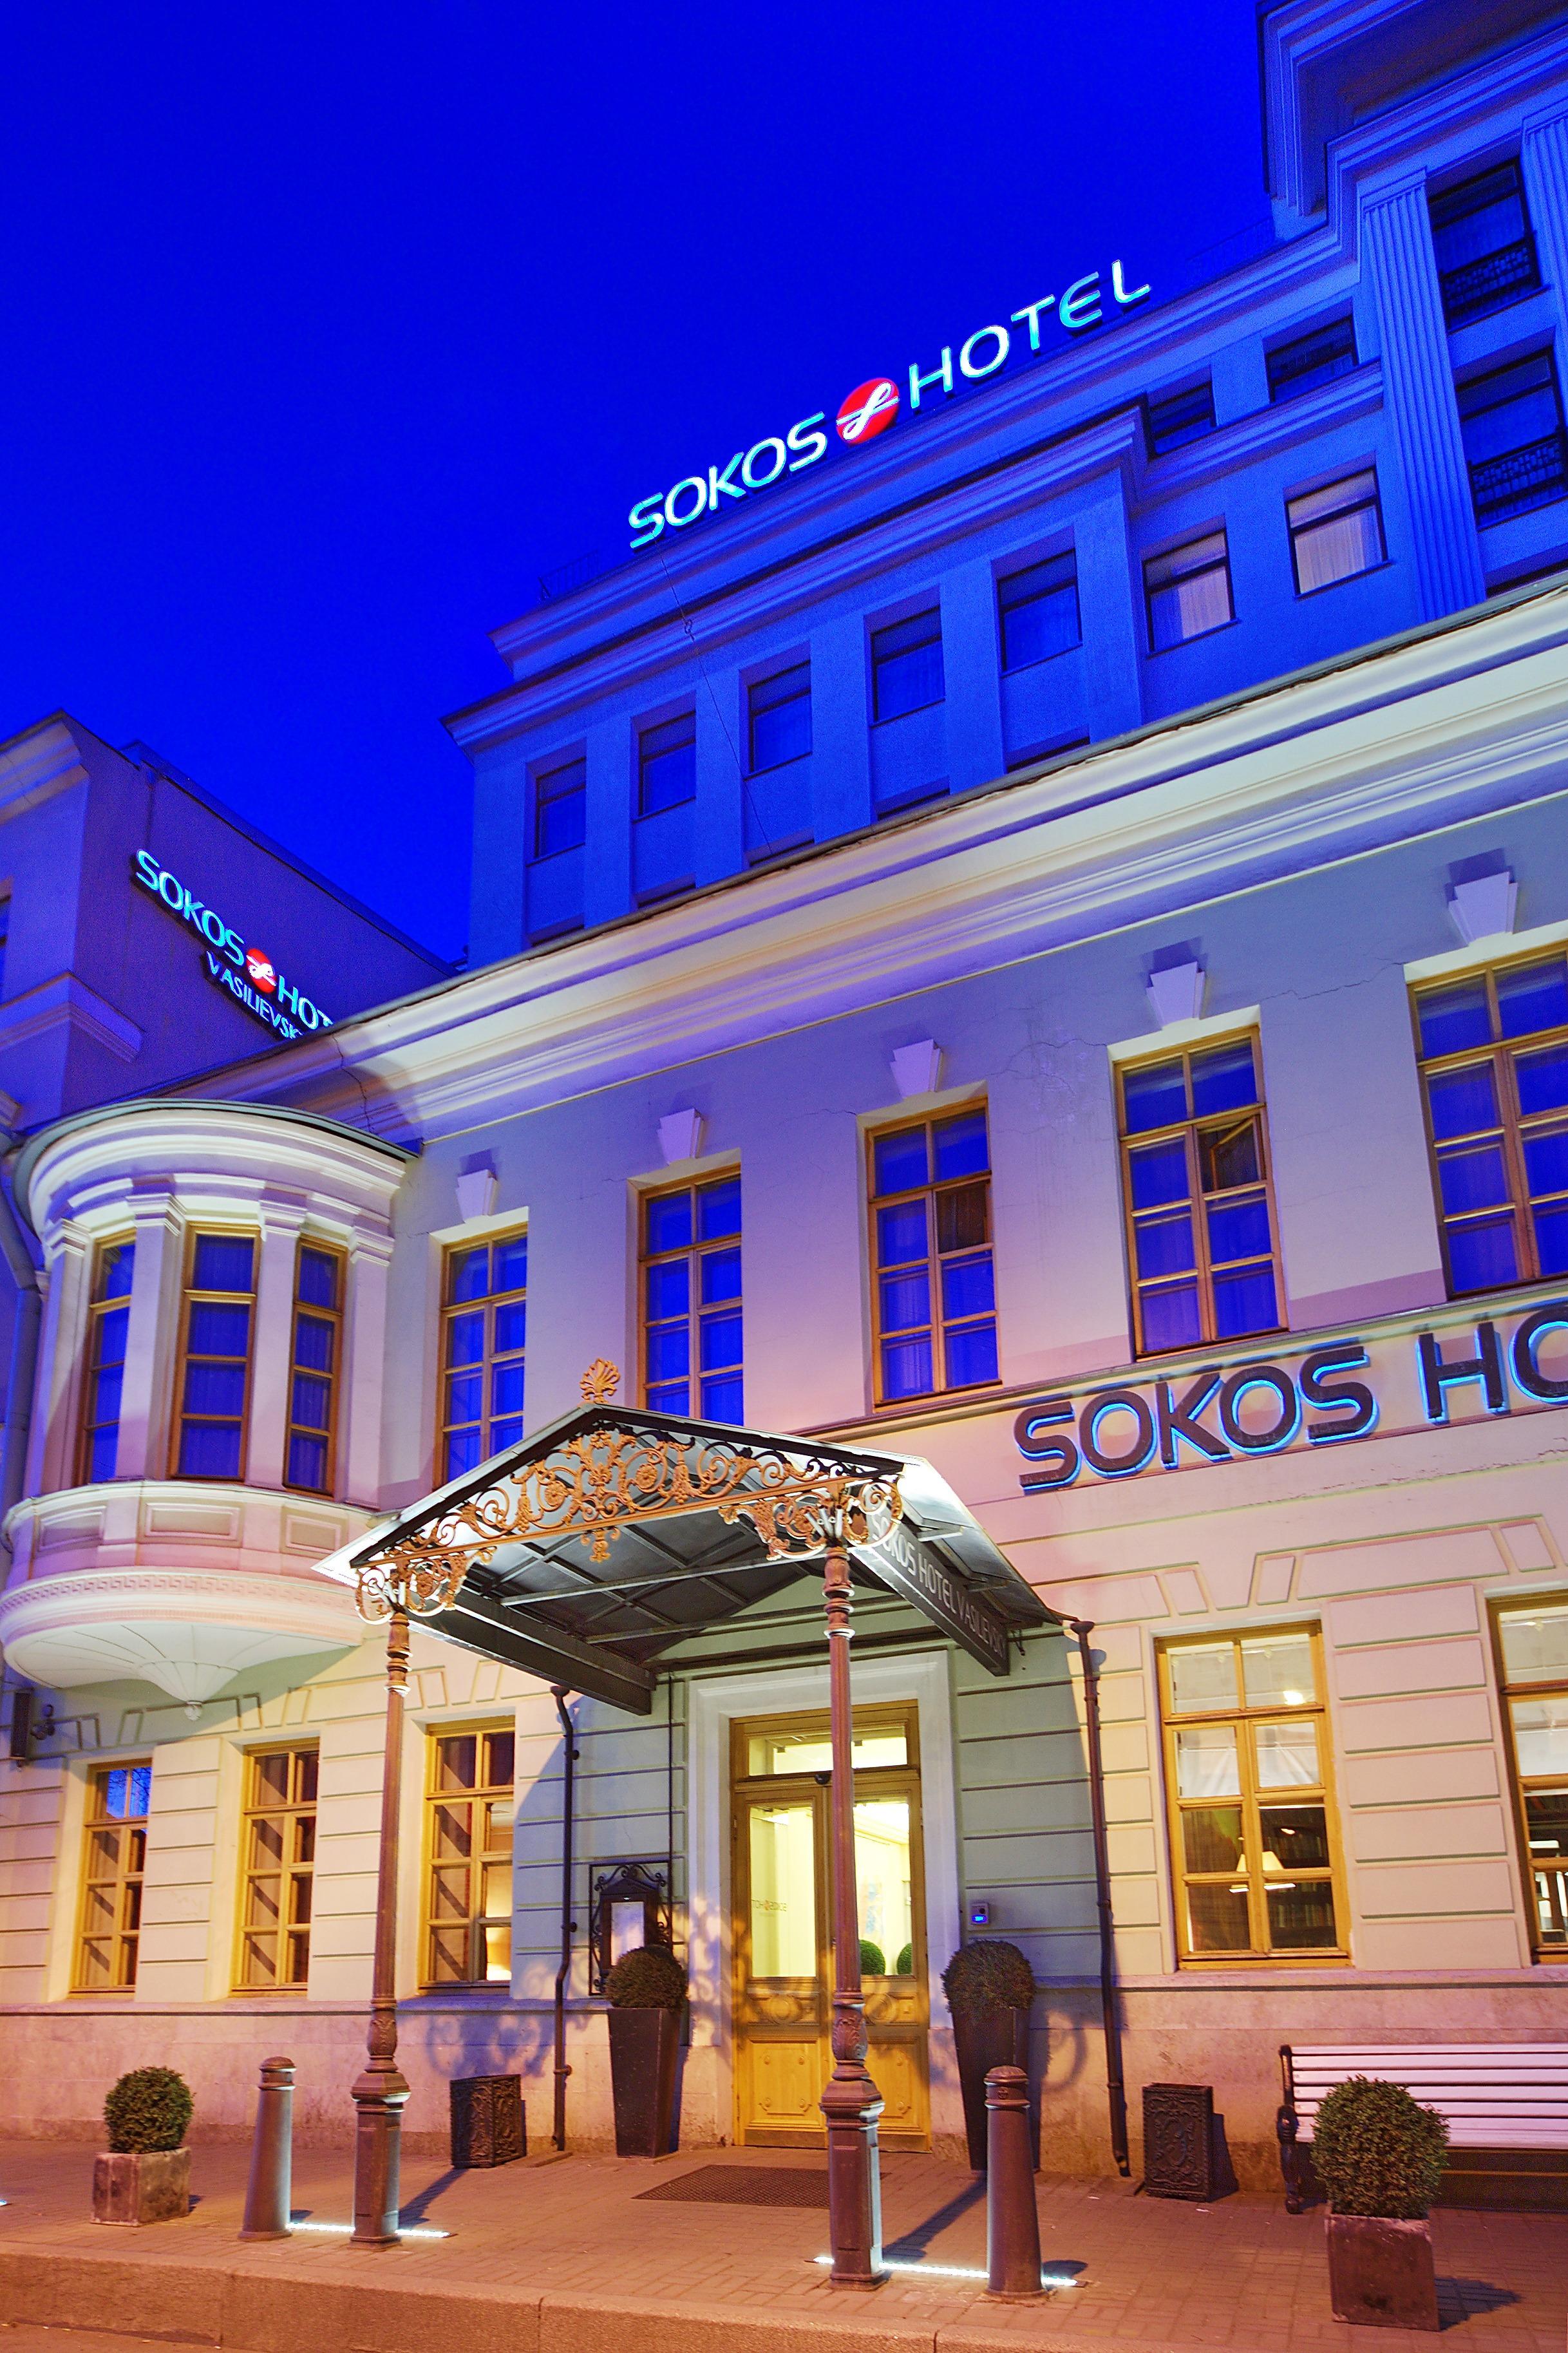 Sokos-Hotellit